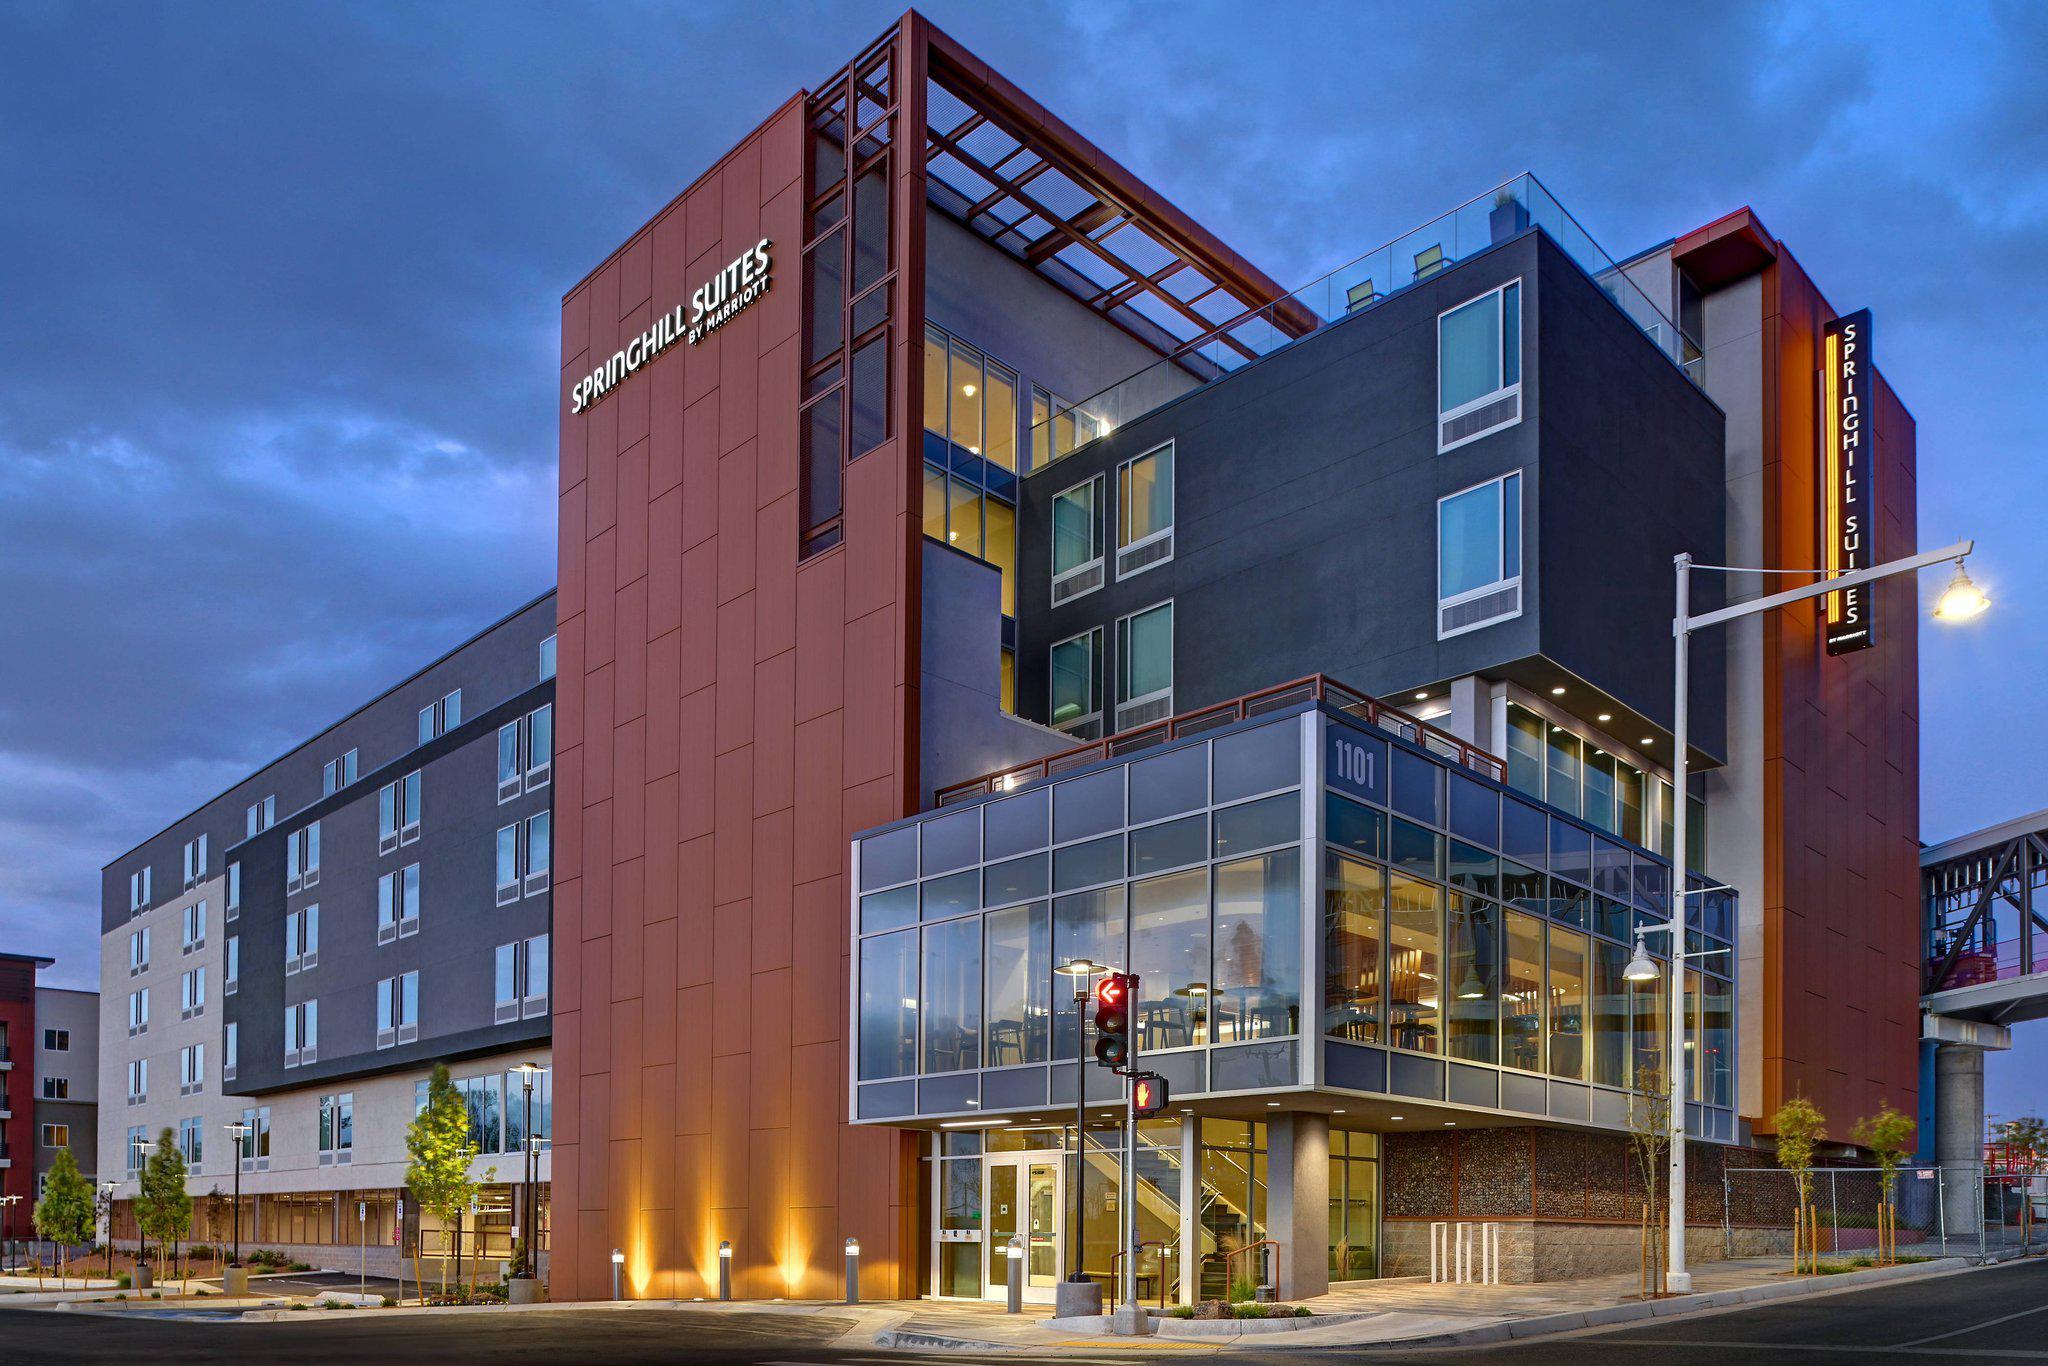 SpringHill Suites by Marriott Albuquerque University Area